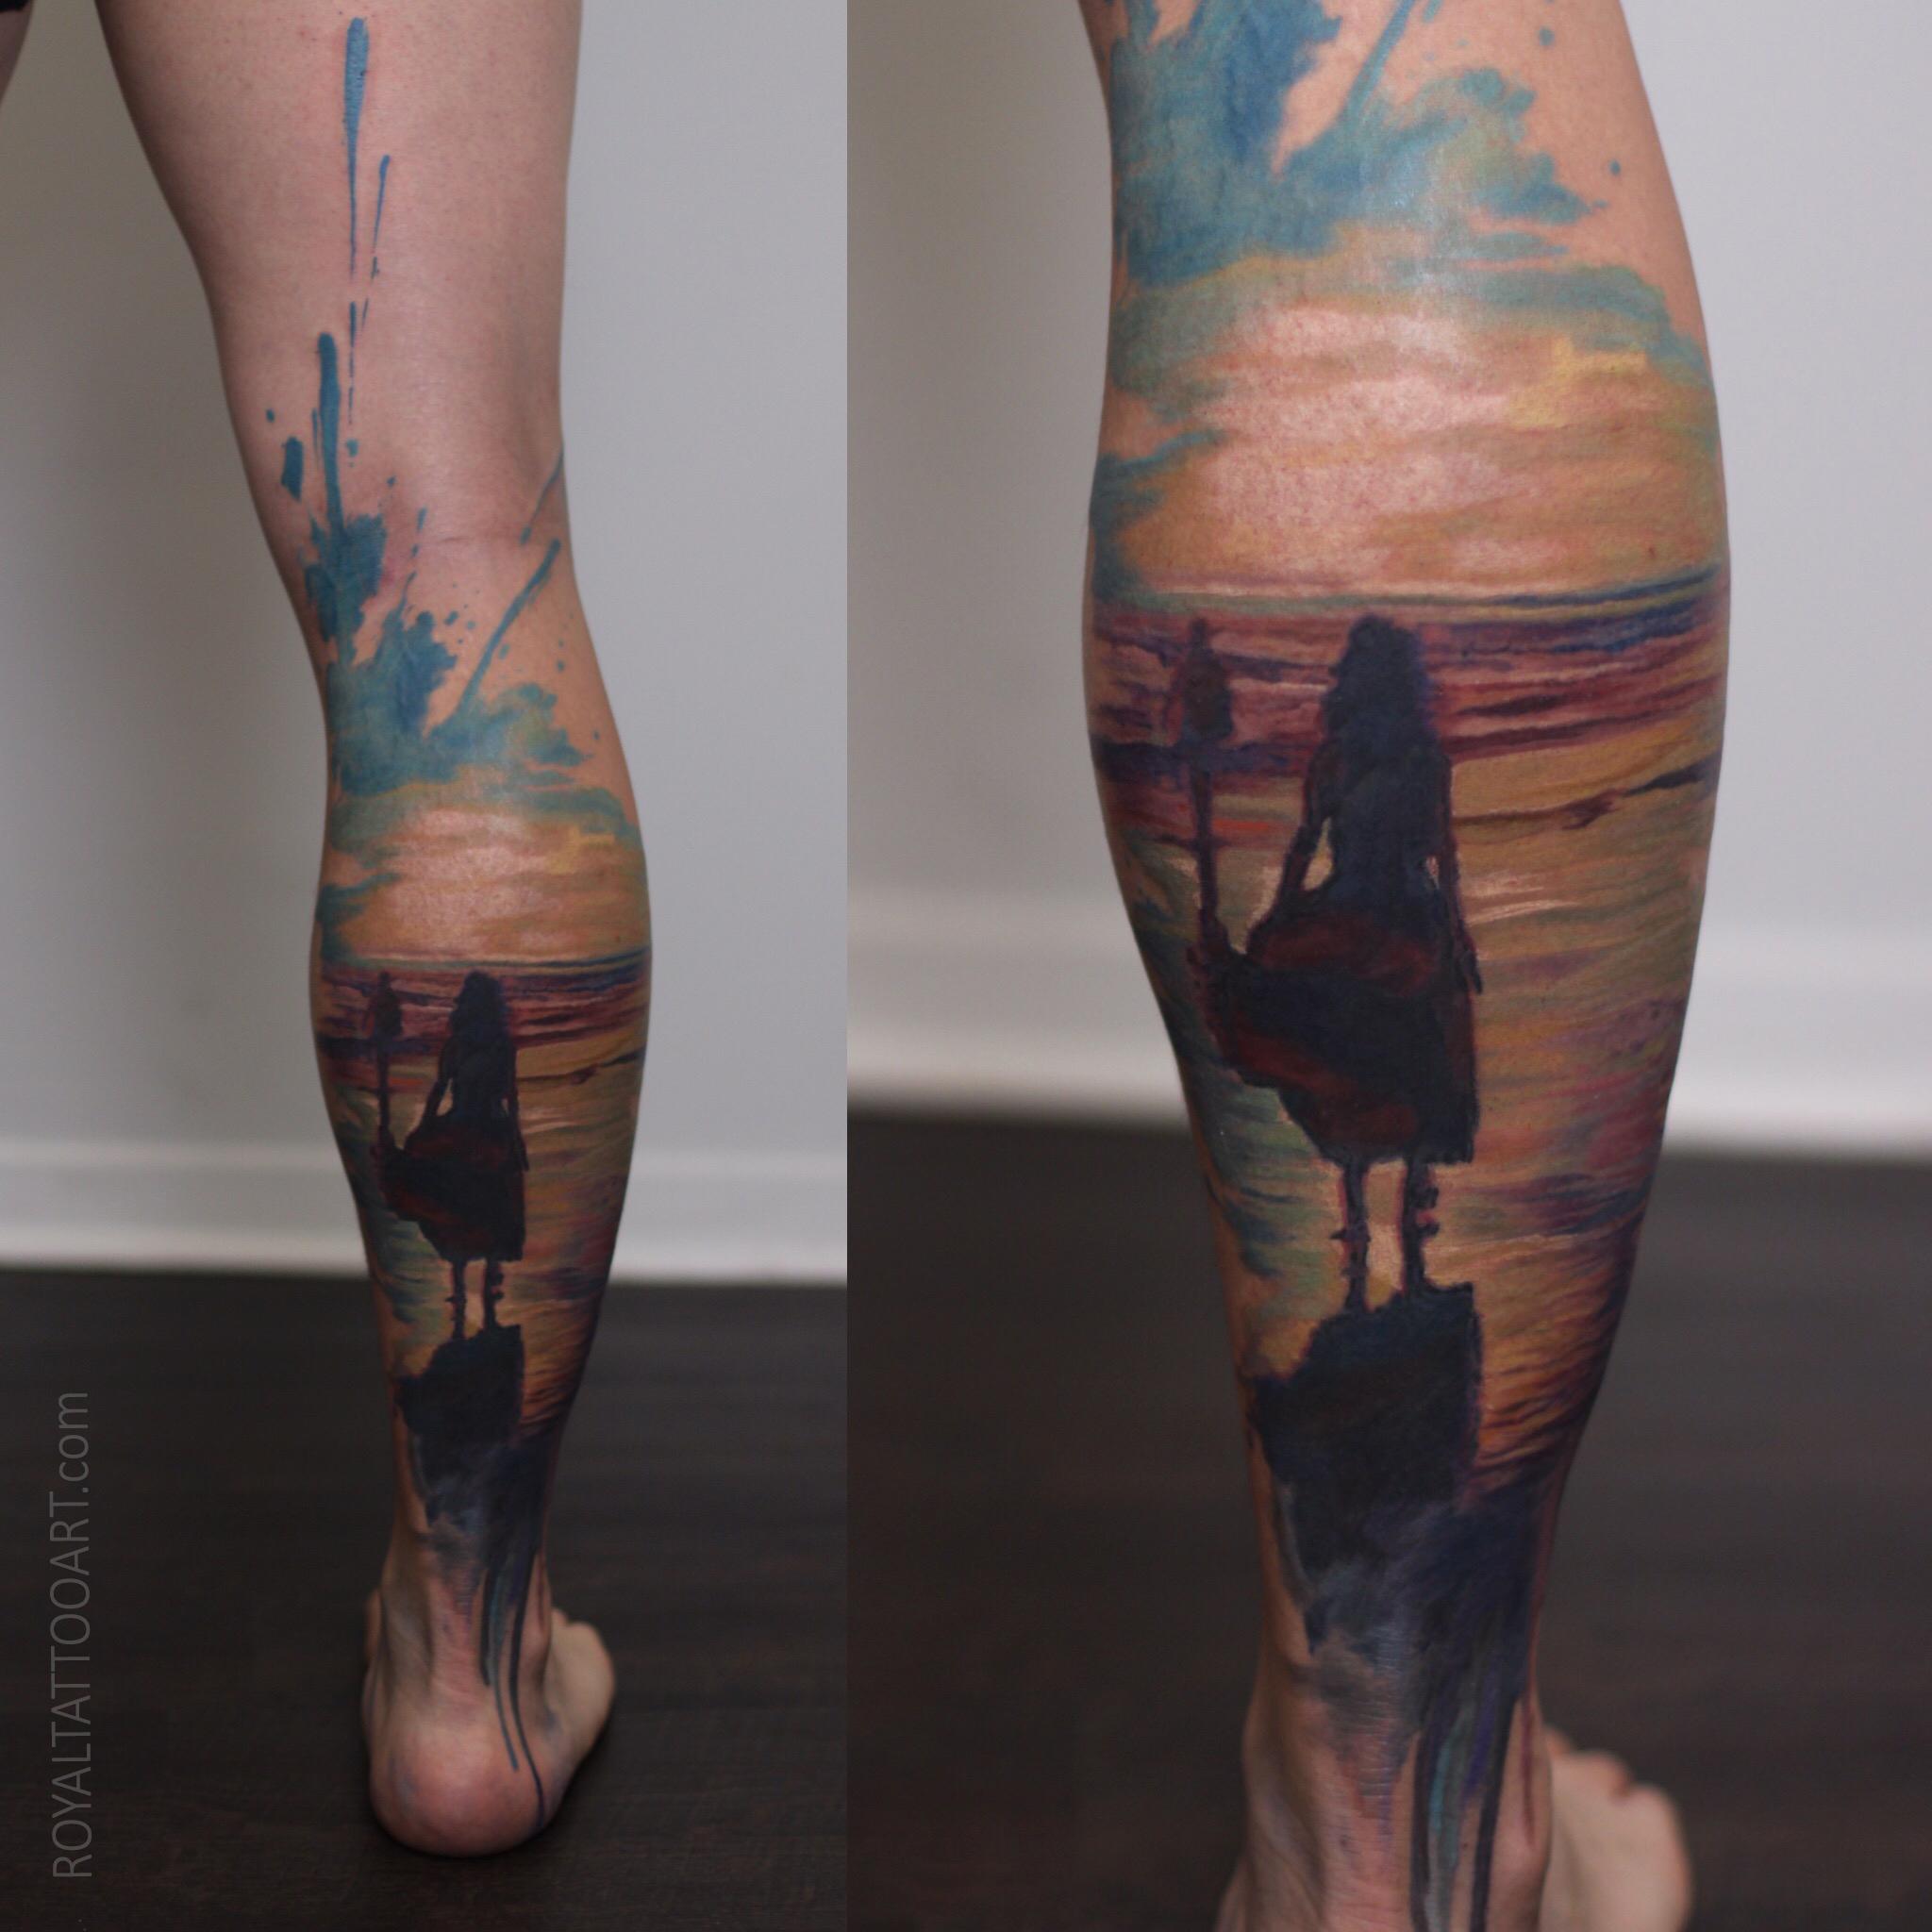 watercolor abstract tattoo realism ocean beach sunset nyc new york tattooer artist best